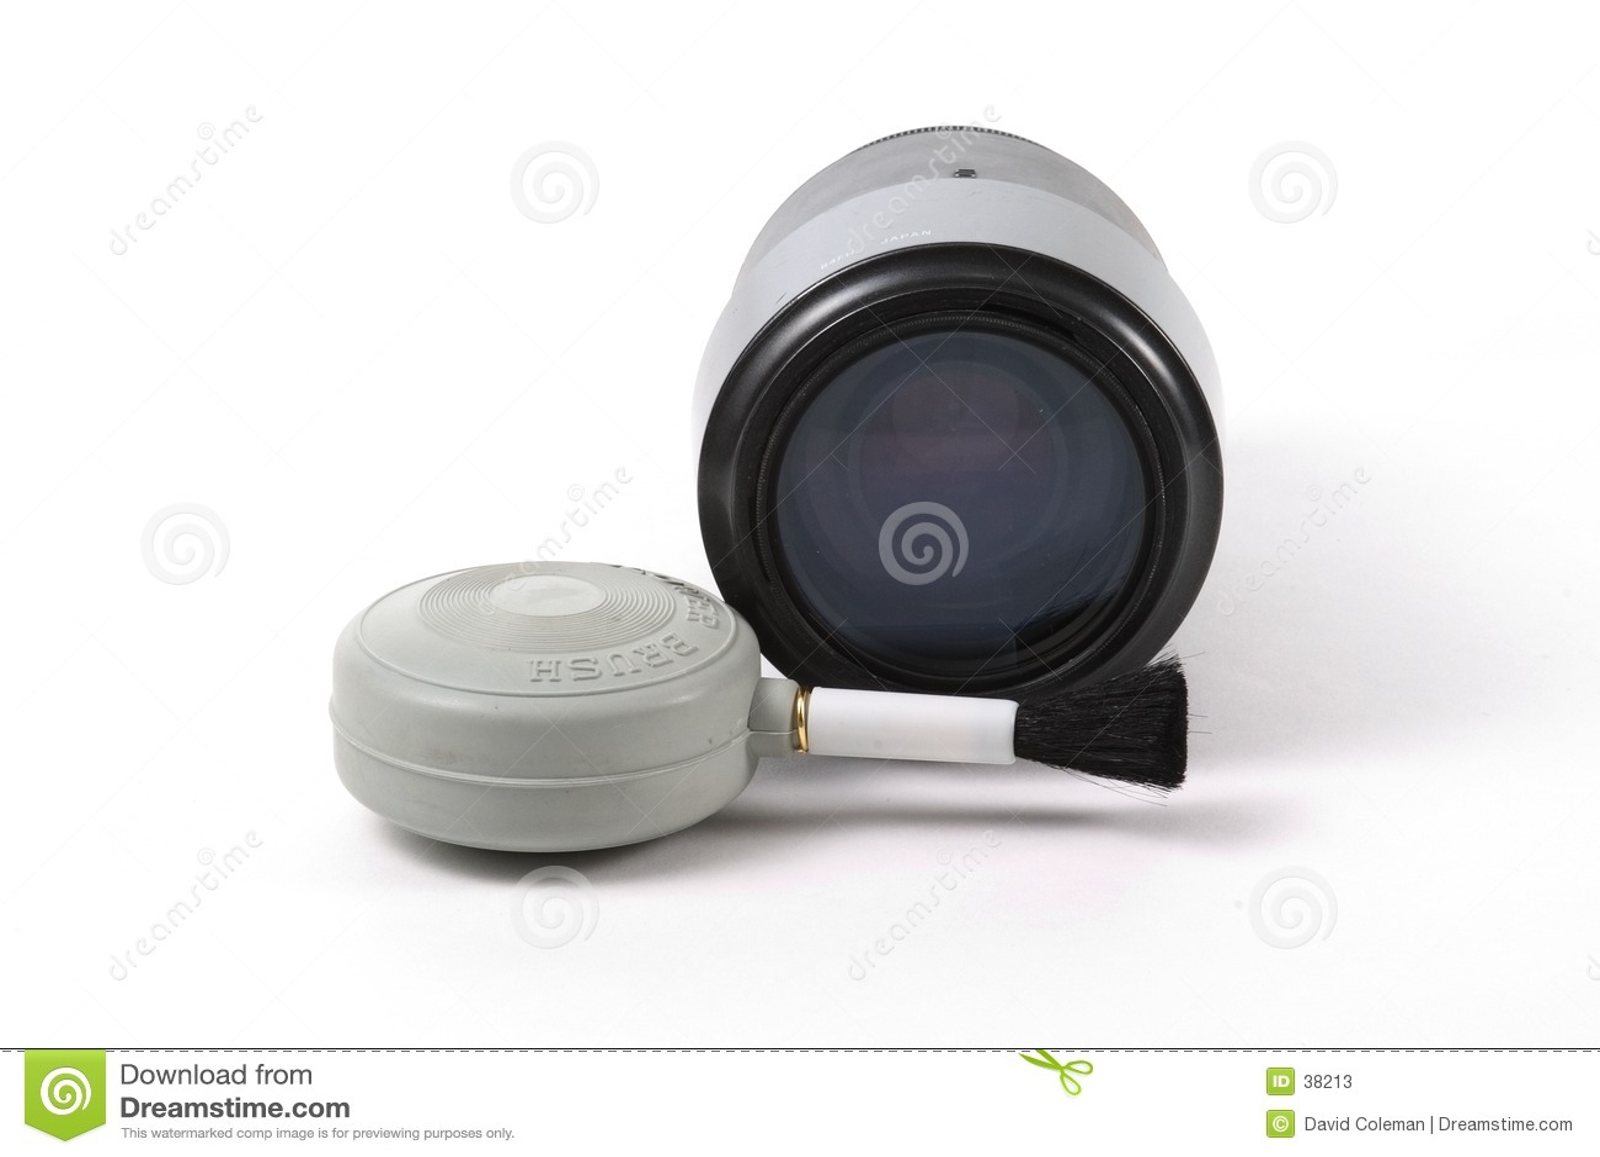 Lense and Blower Brush